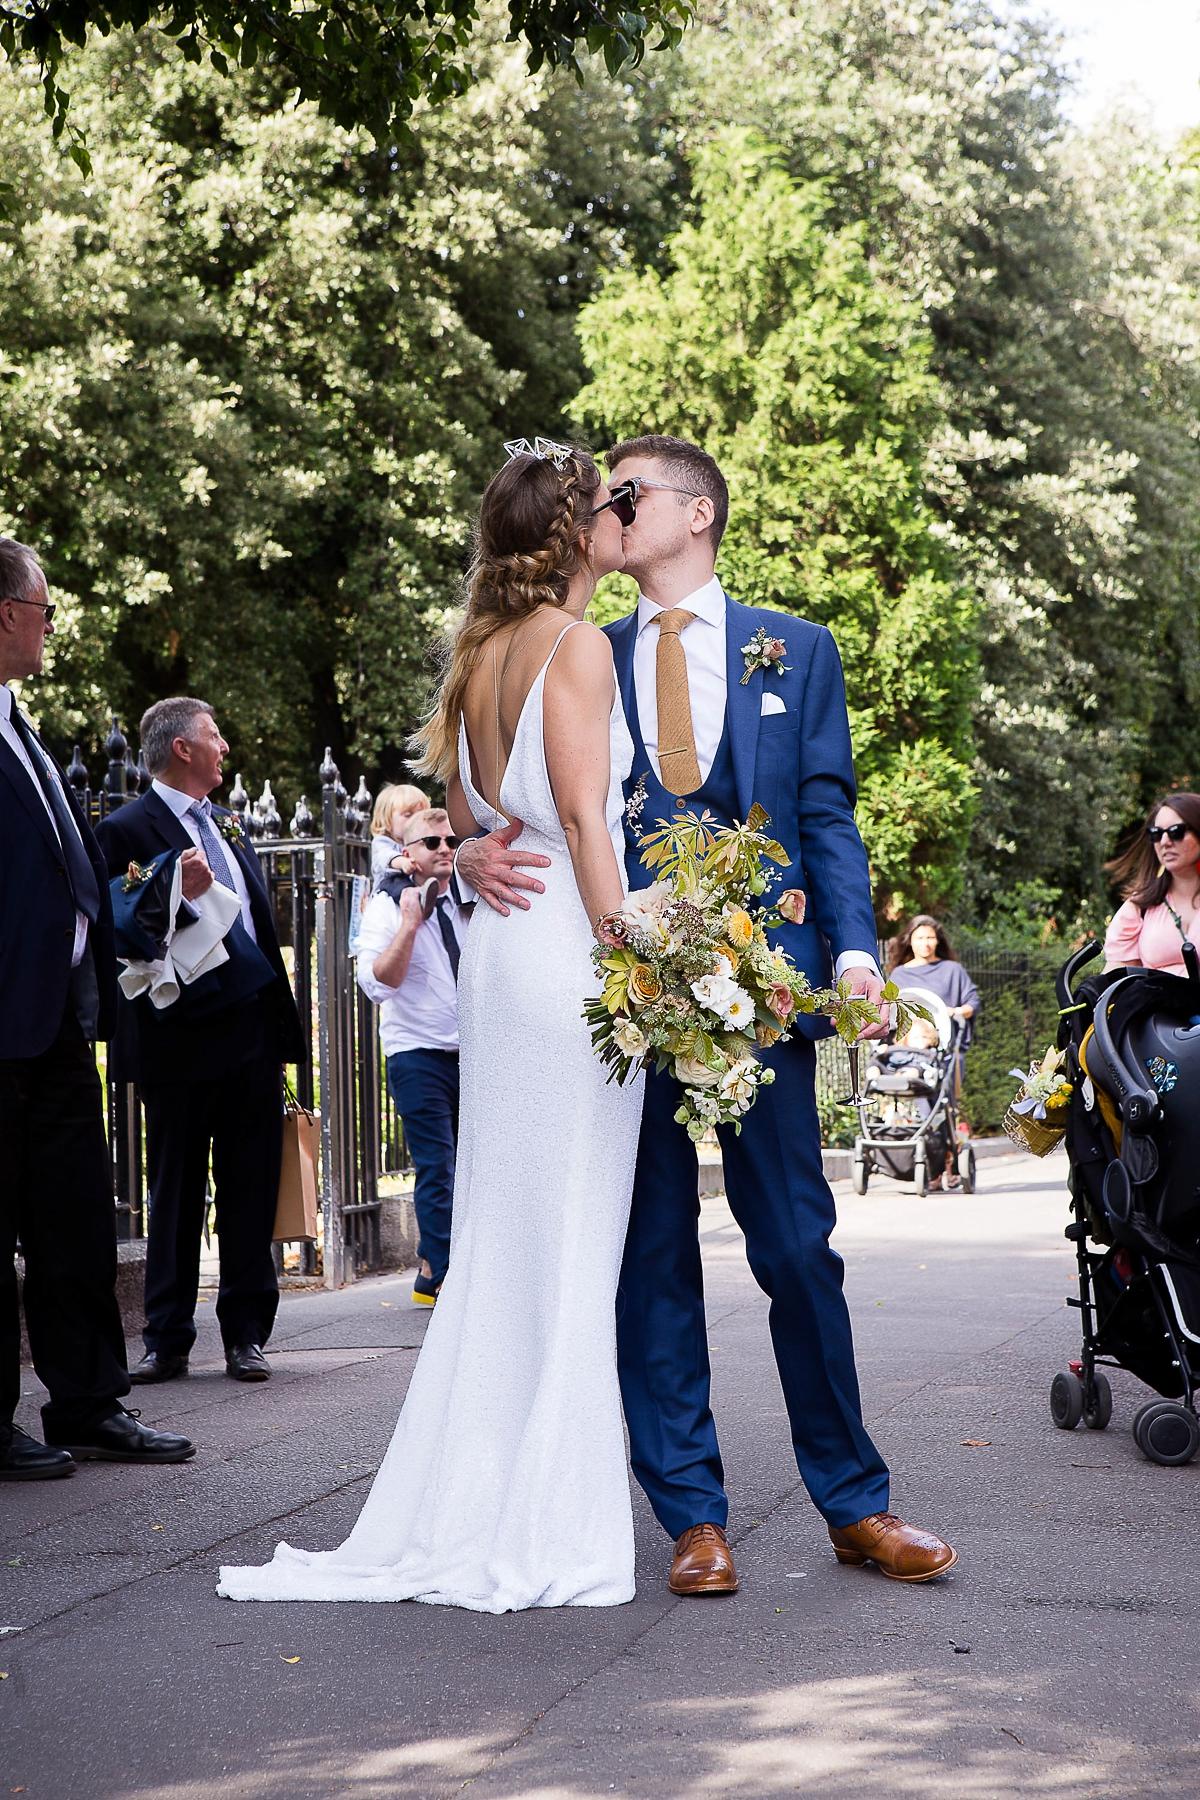 And-For-Love-wedding-dress-24.jpg